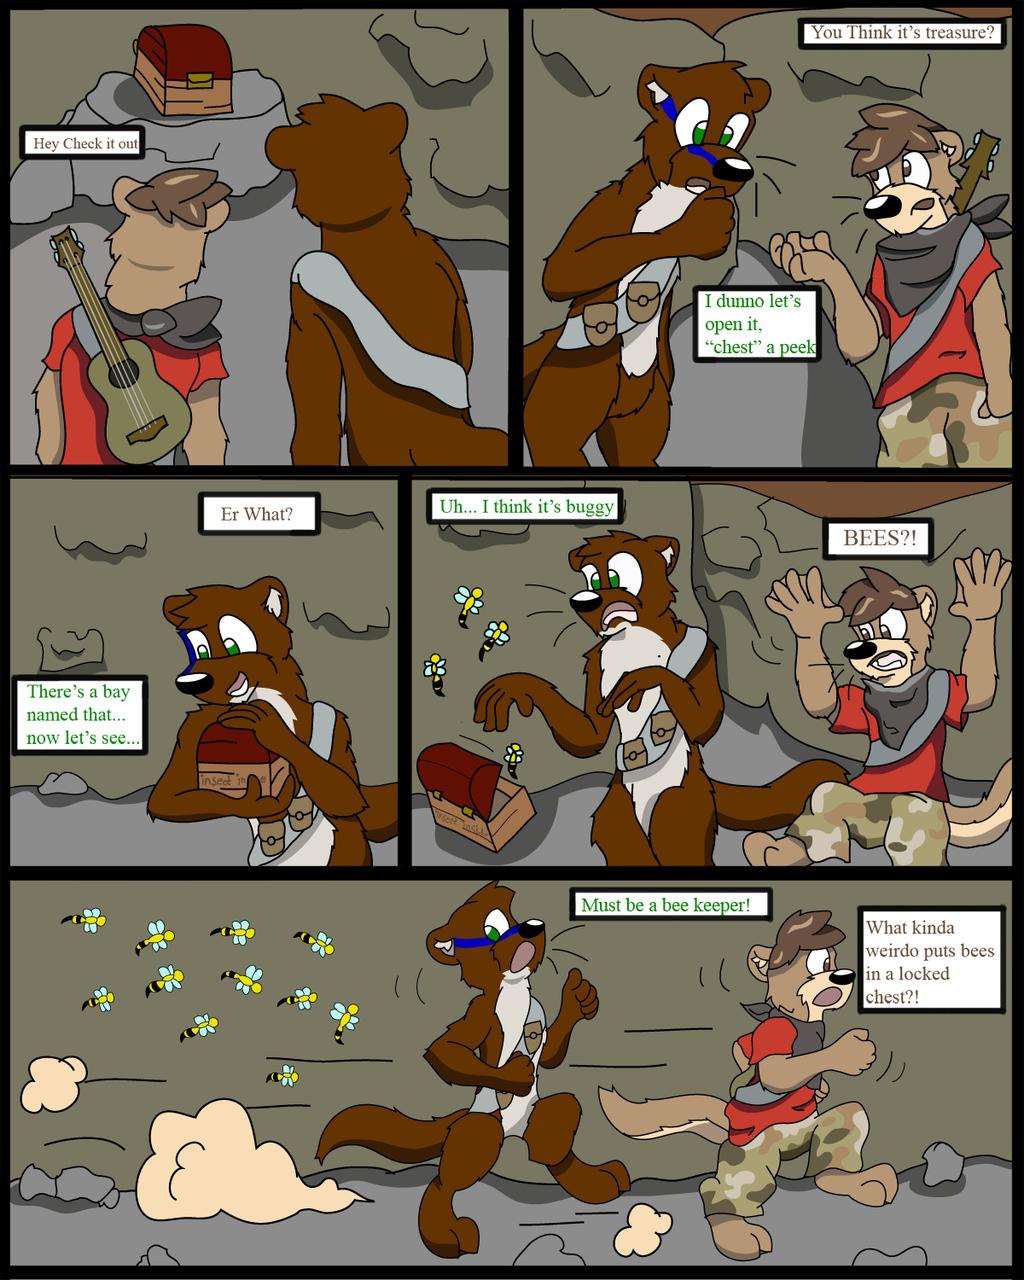 Treasure hunting when suddenly....